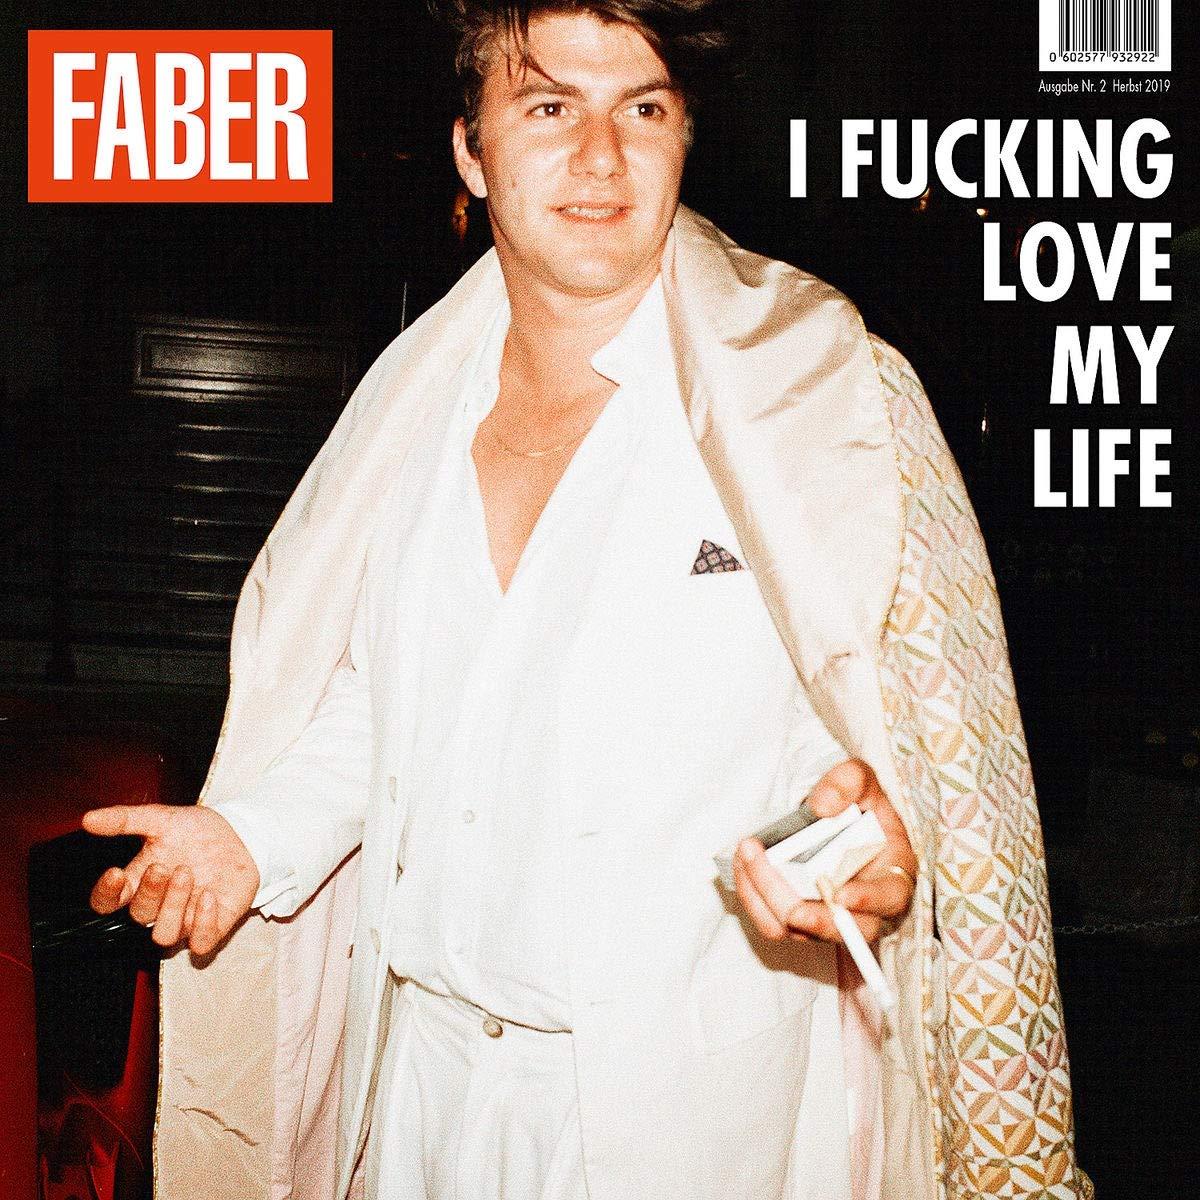 Faber | I fucking love my life